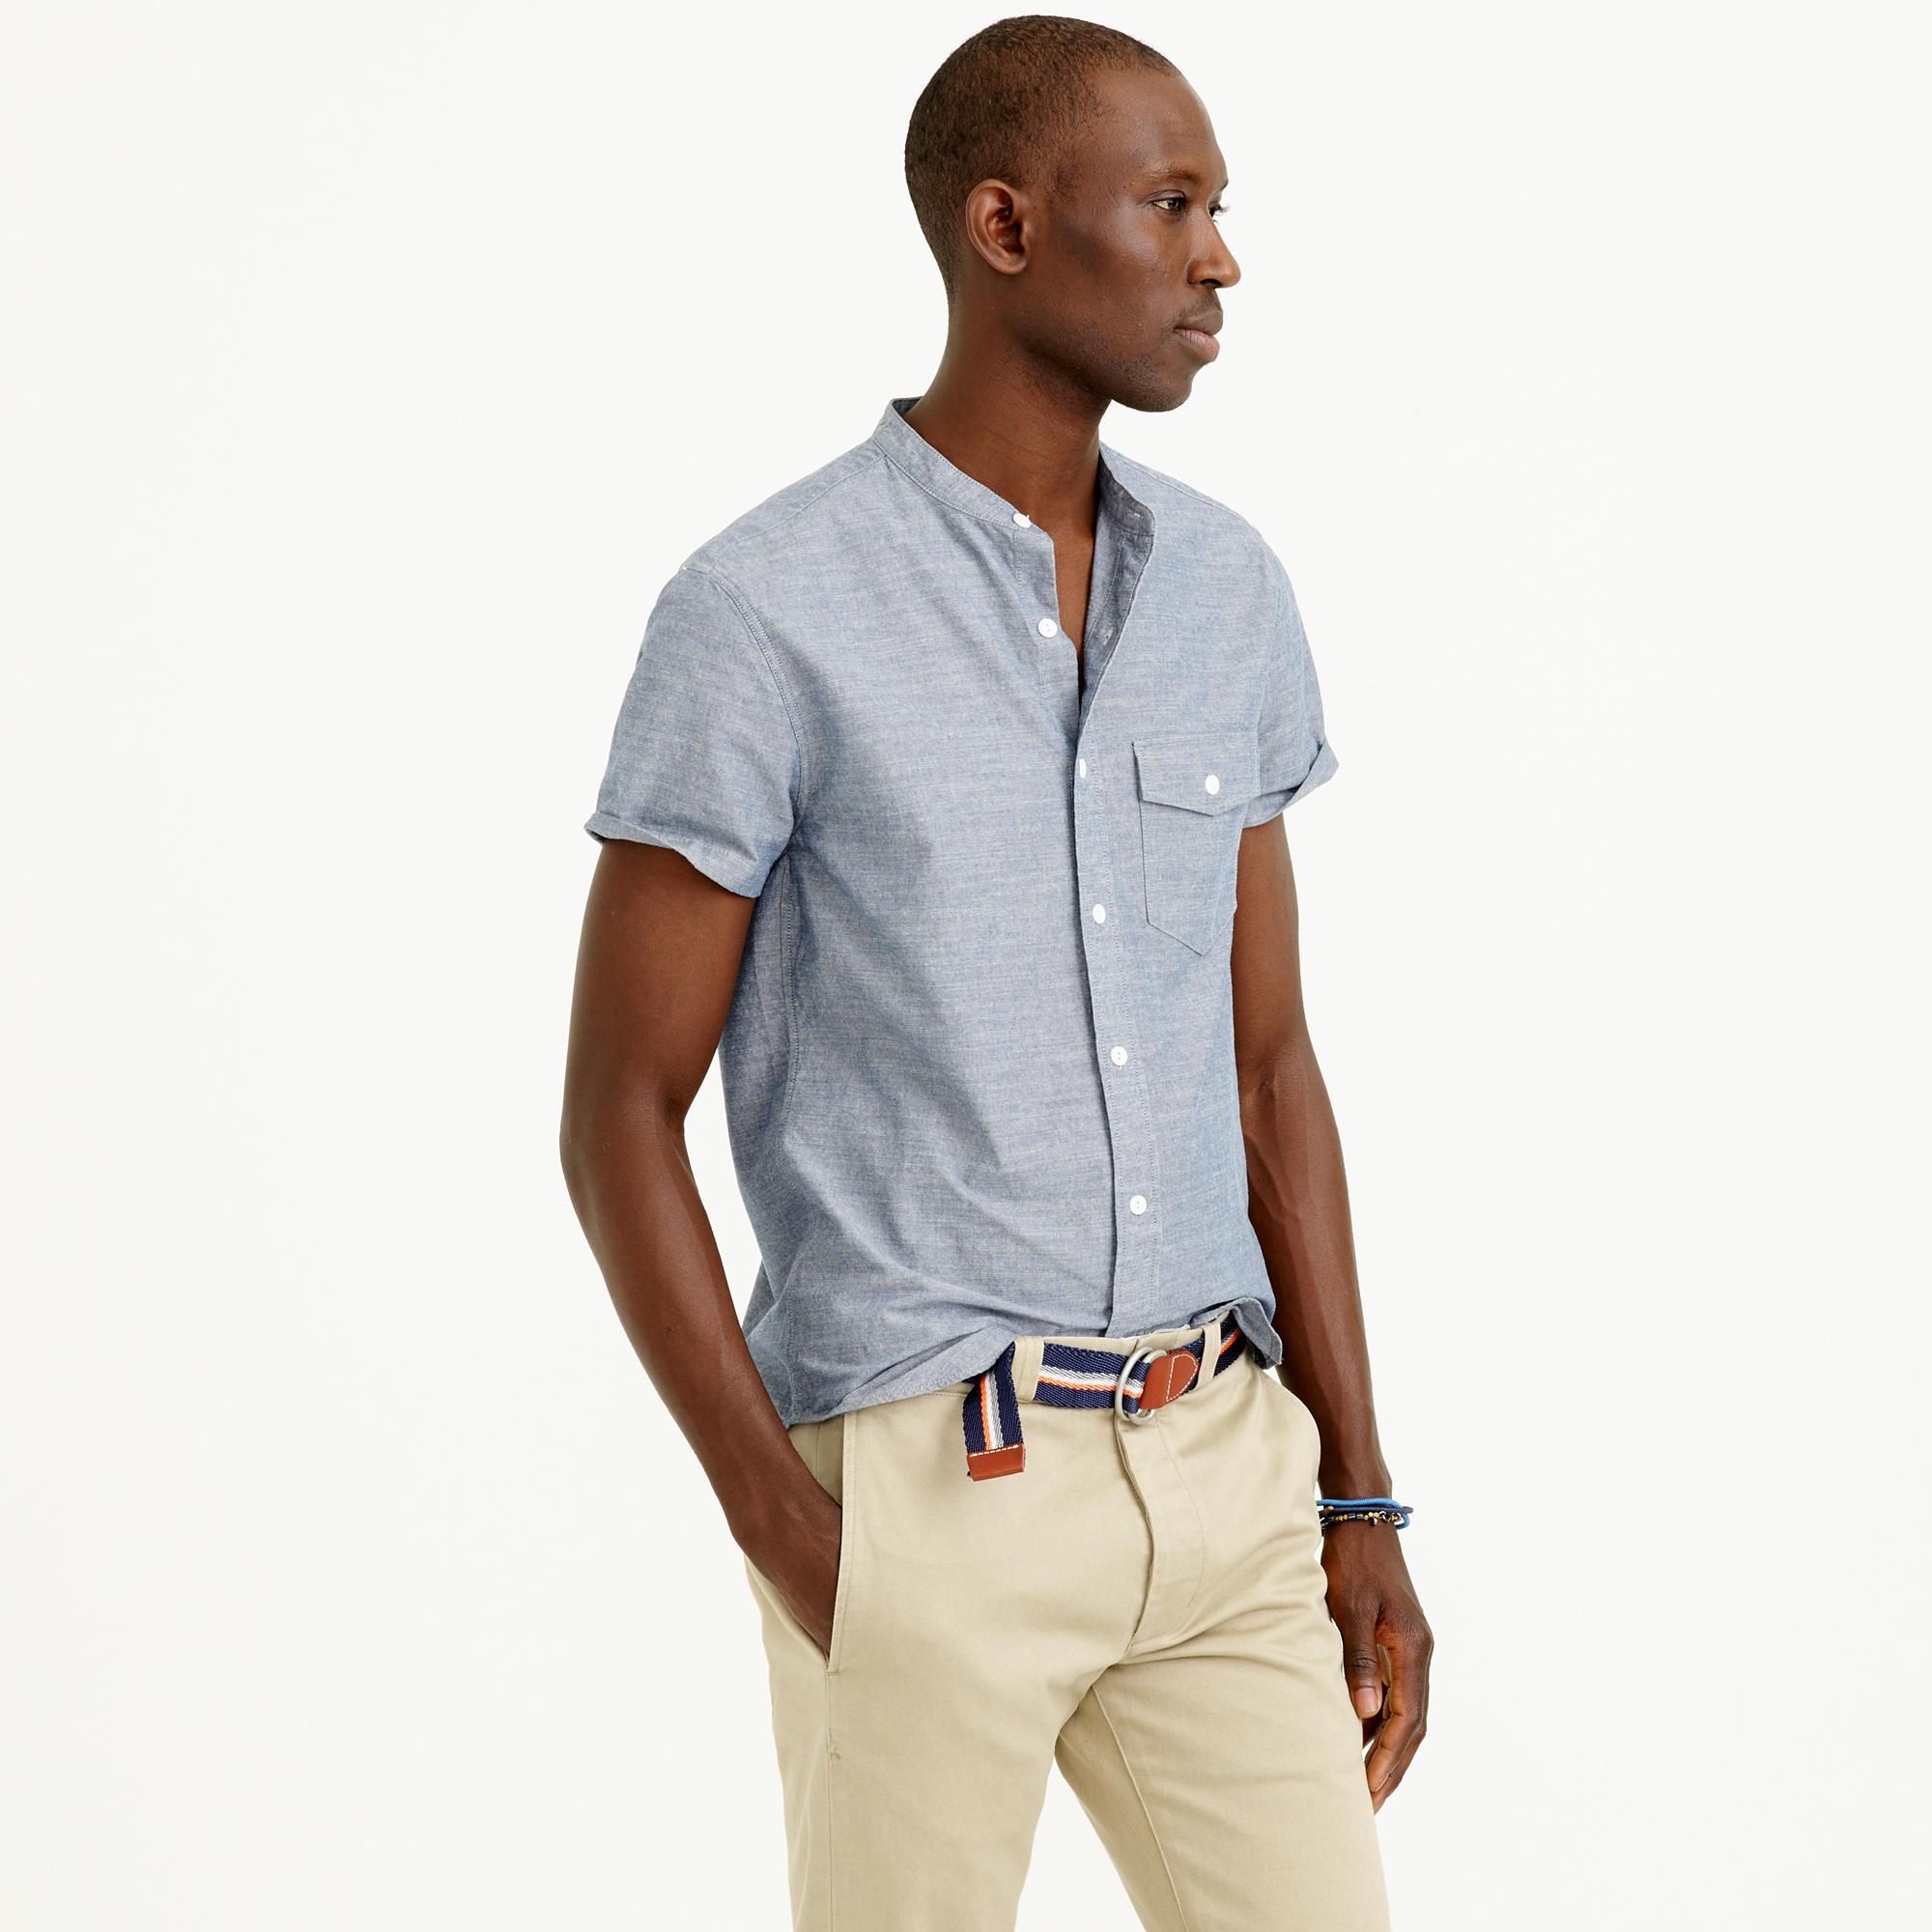 monogram dress shirts for men